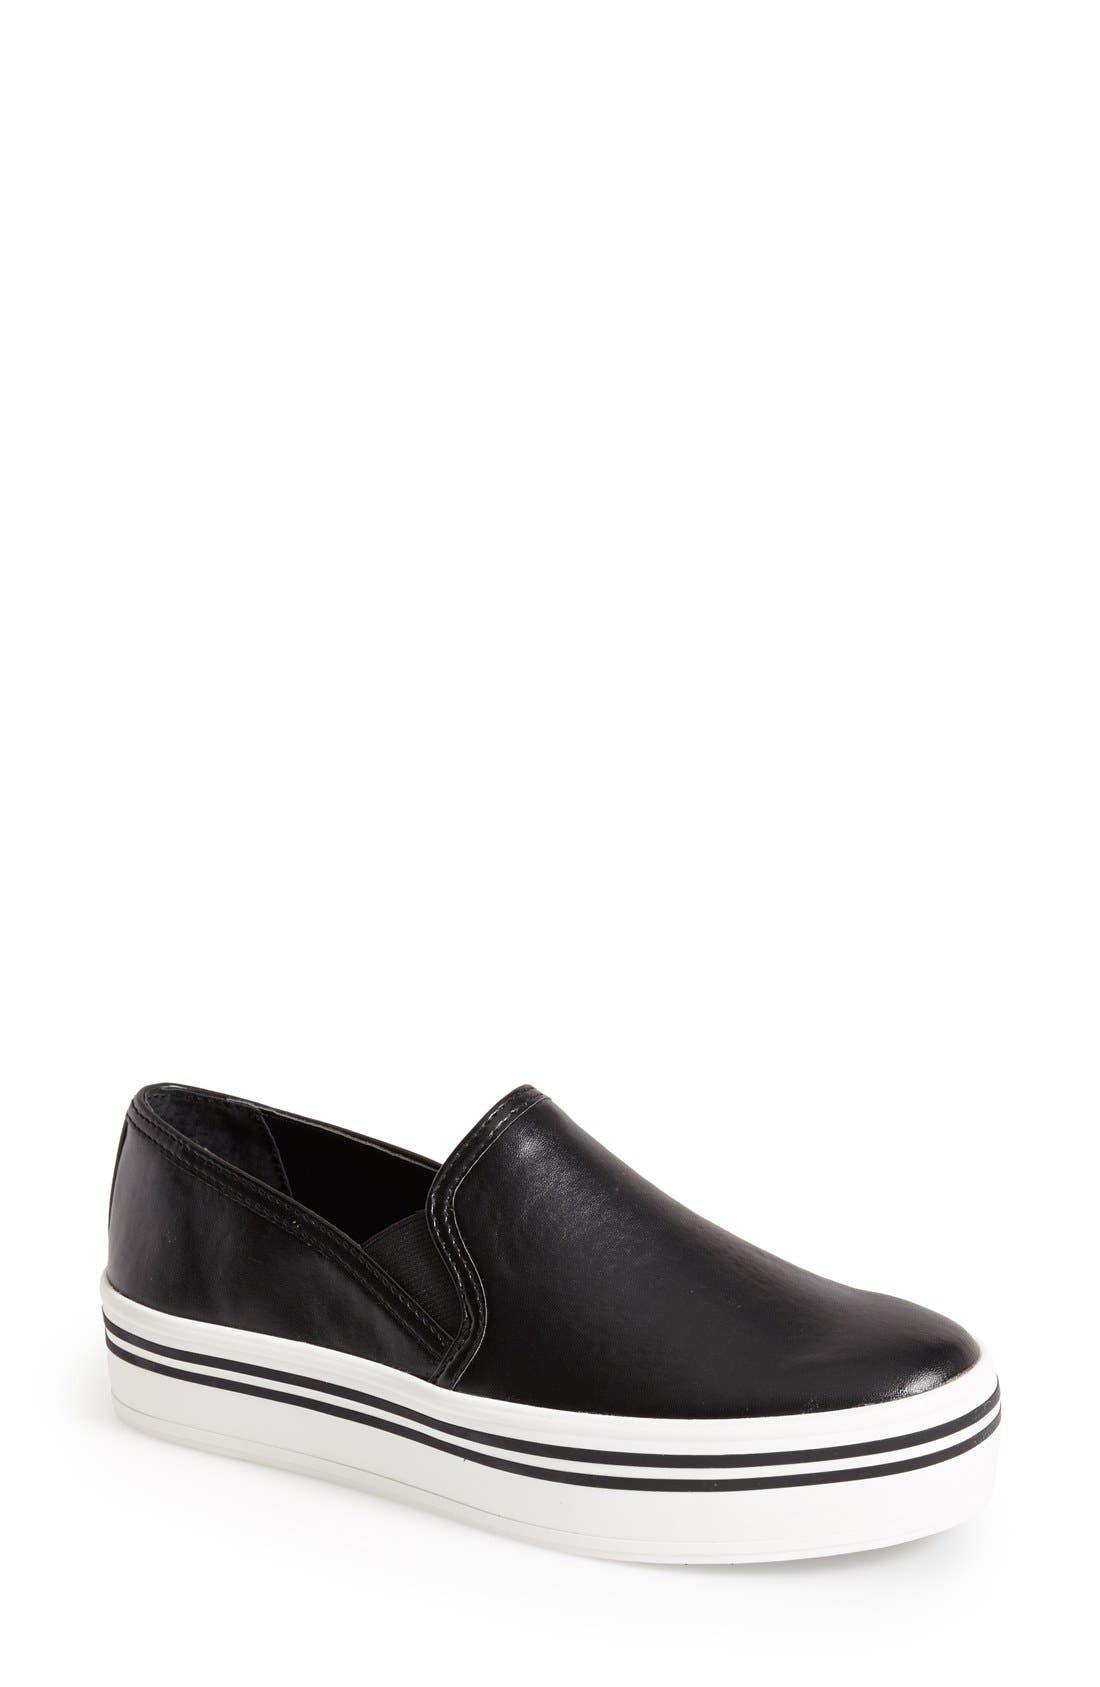 Alternate Image 1 Selected - DV by Dolce Vita 'Jinsy' Slip-On Sneaker (Women)